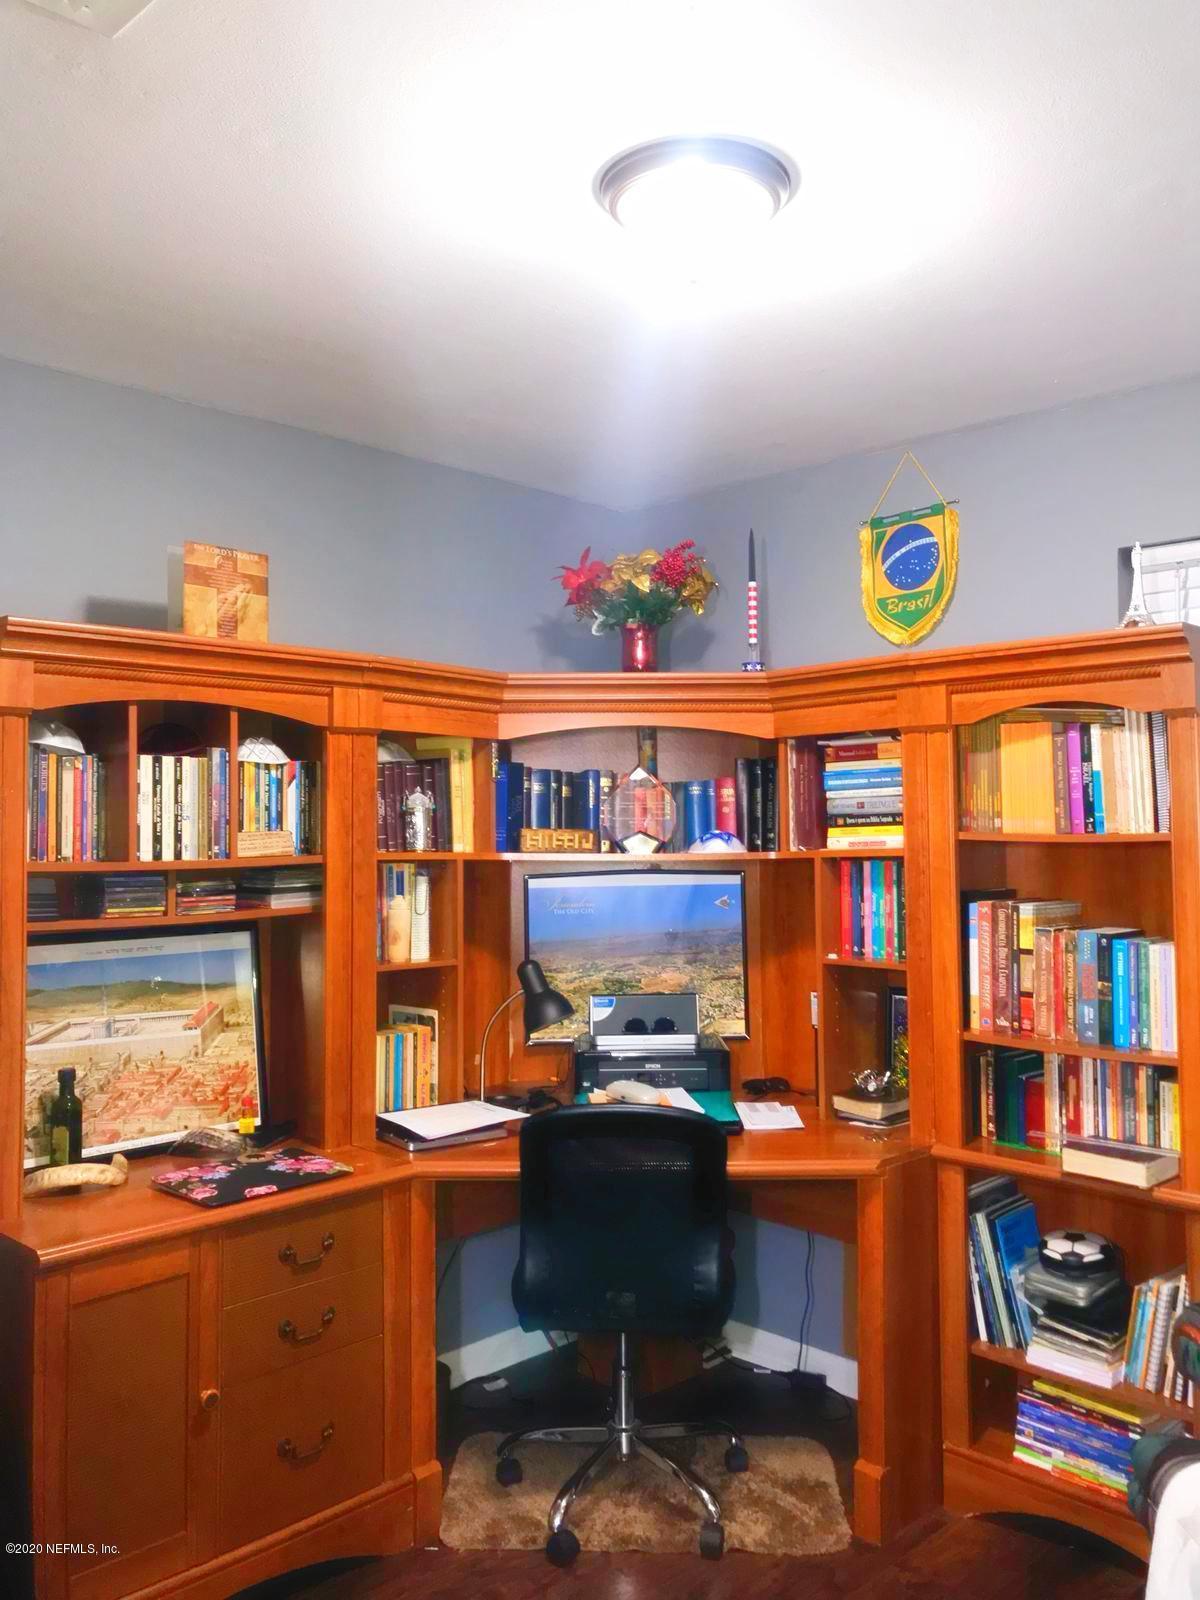 2906 RIBAULT SCENIC, JACKSONVILLE, FLORIDA 32208, 3 Bedrooms Bedrooms, ,2 BathroomsBathrooms,Residential,For sale,RIBAULT SCENIC,1084373